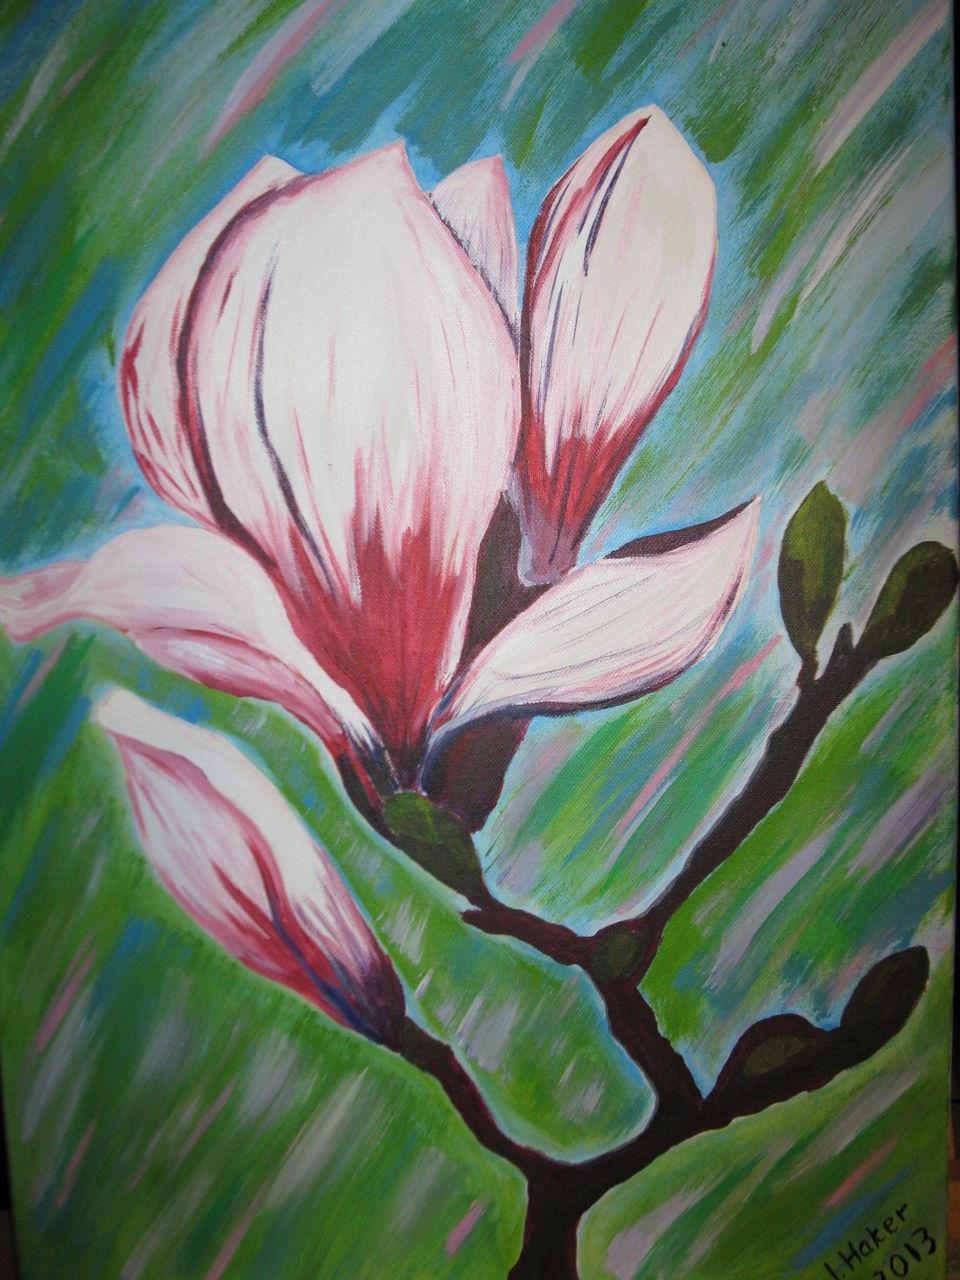 magnolie magnolie acryl magnolie malerei. Black Bedroom Furniture Sets. Home Design Ideas